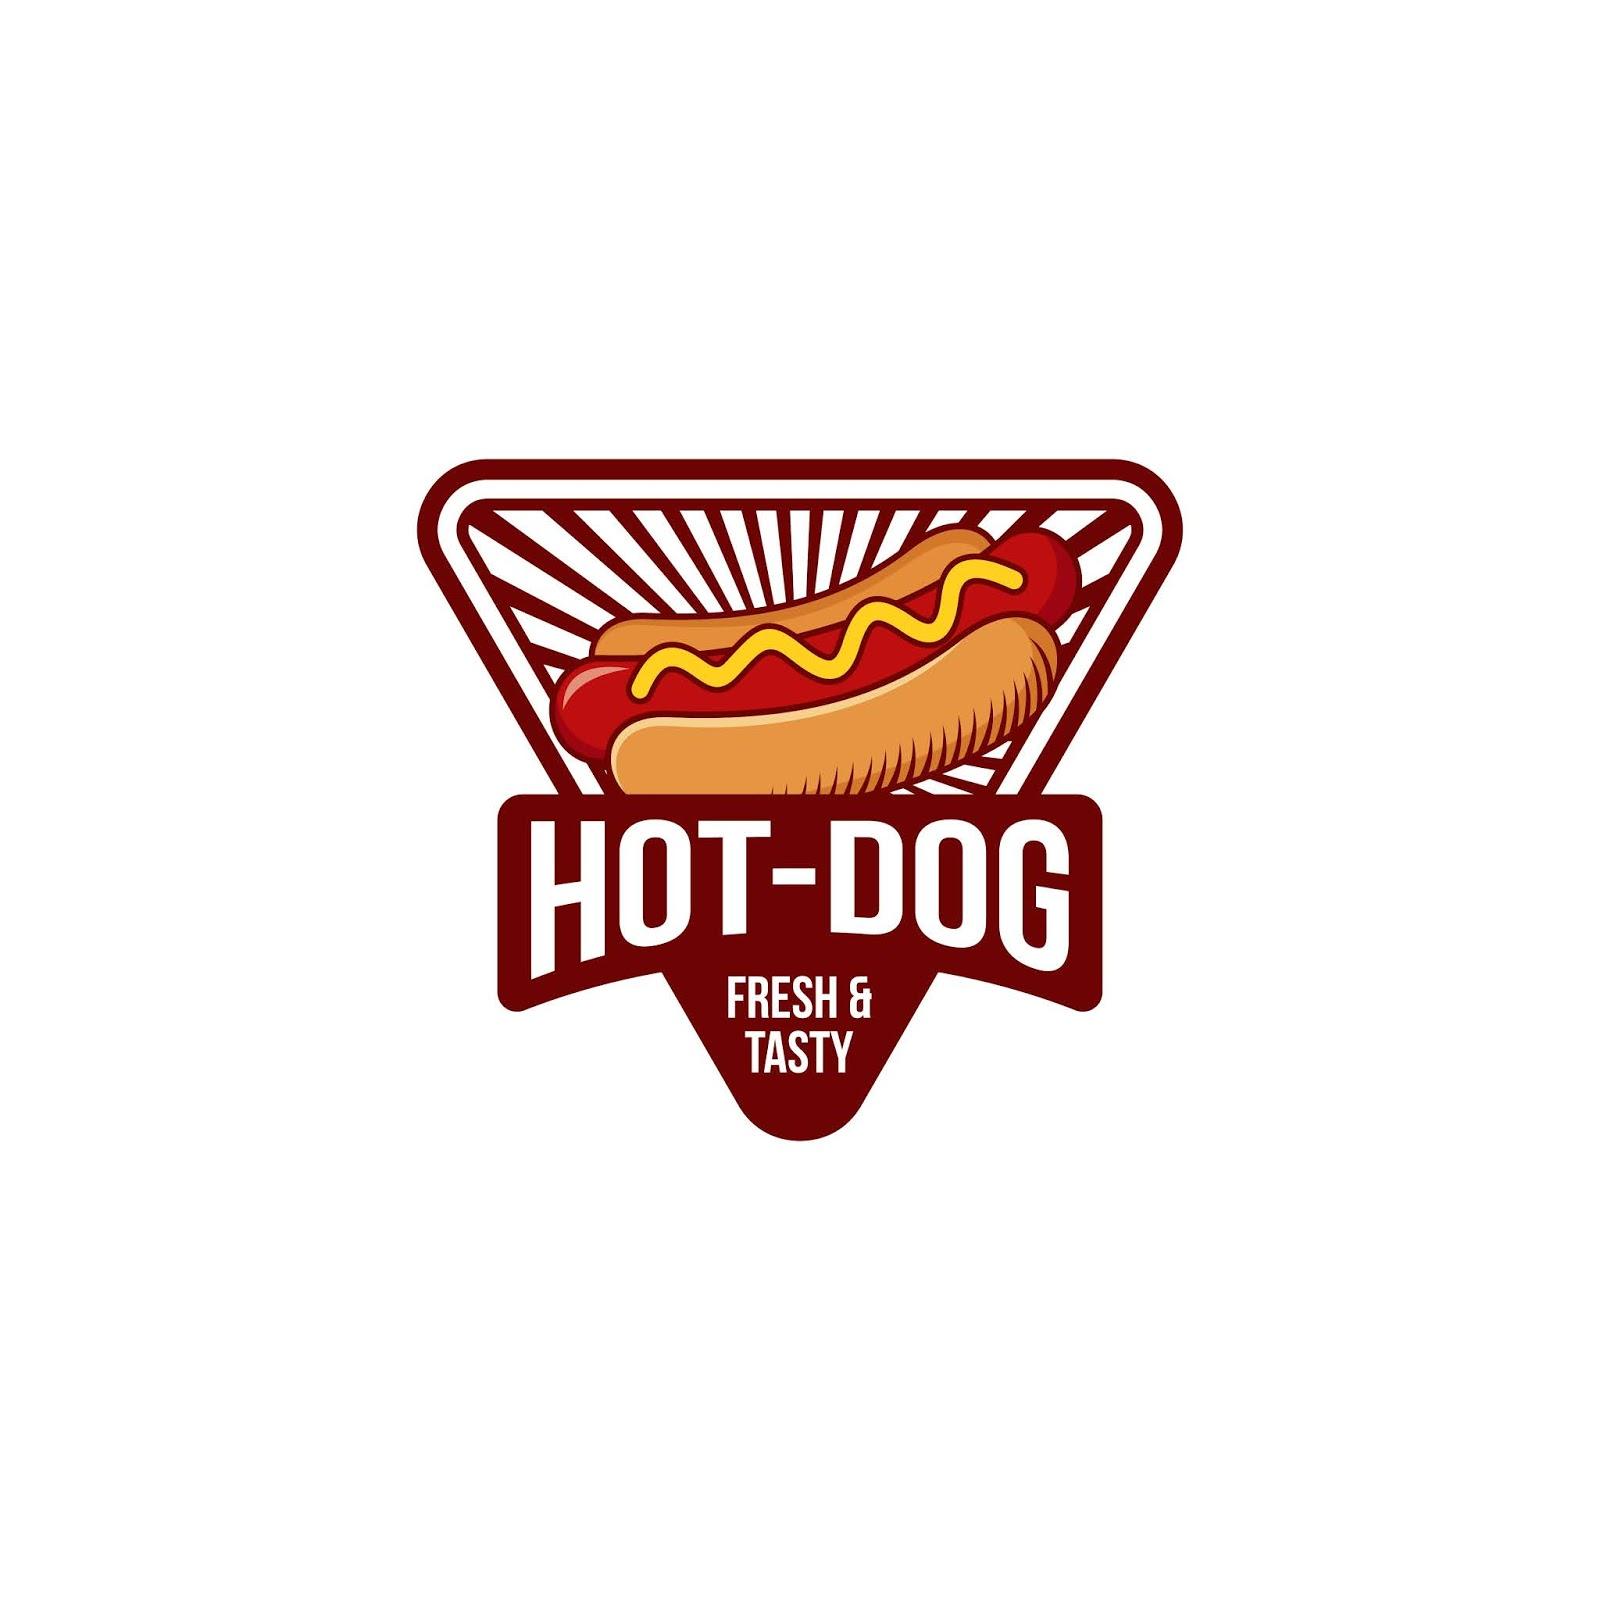 Hot Dog Logo Badge Free Download Vector CDR, AI, EPS and PNG Formats